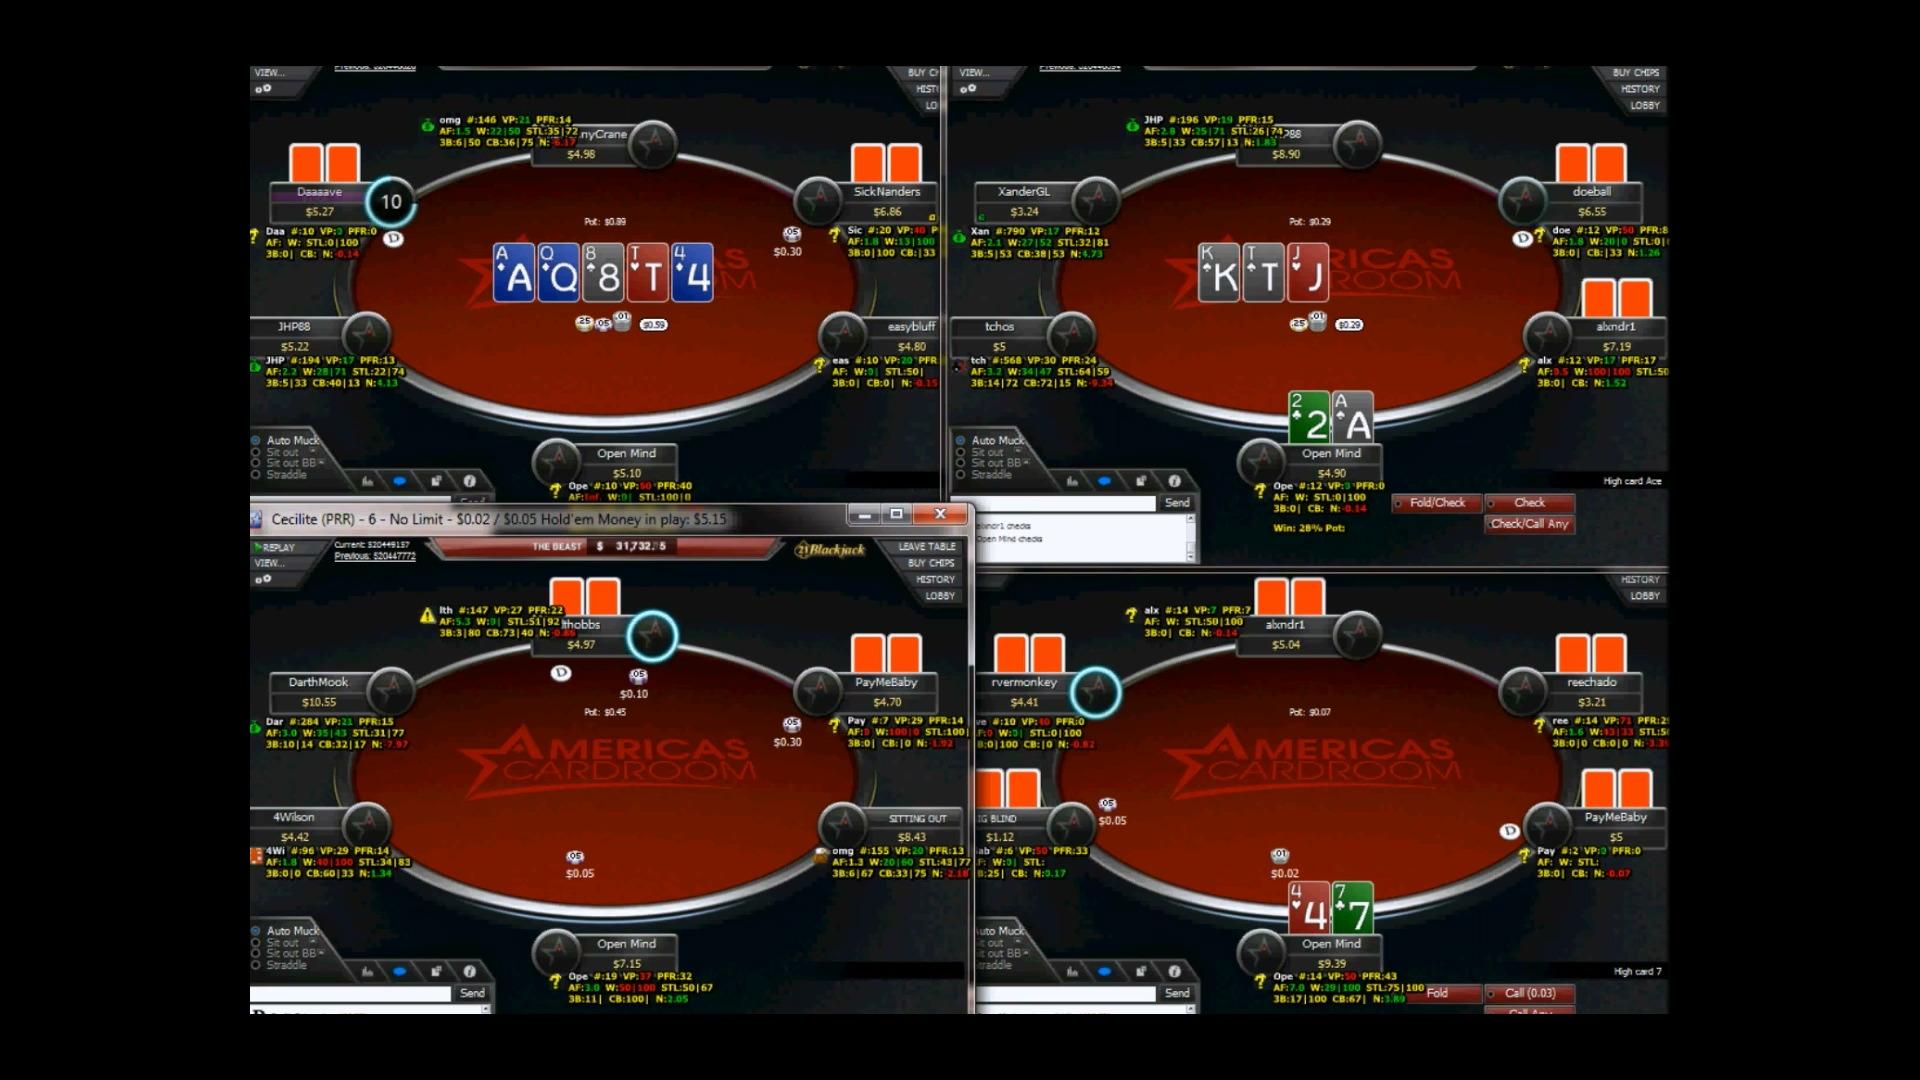 Acr Poker